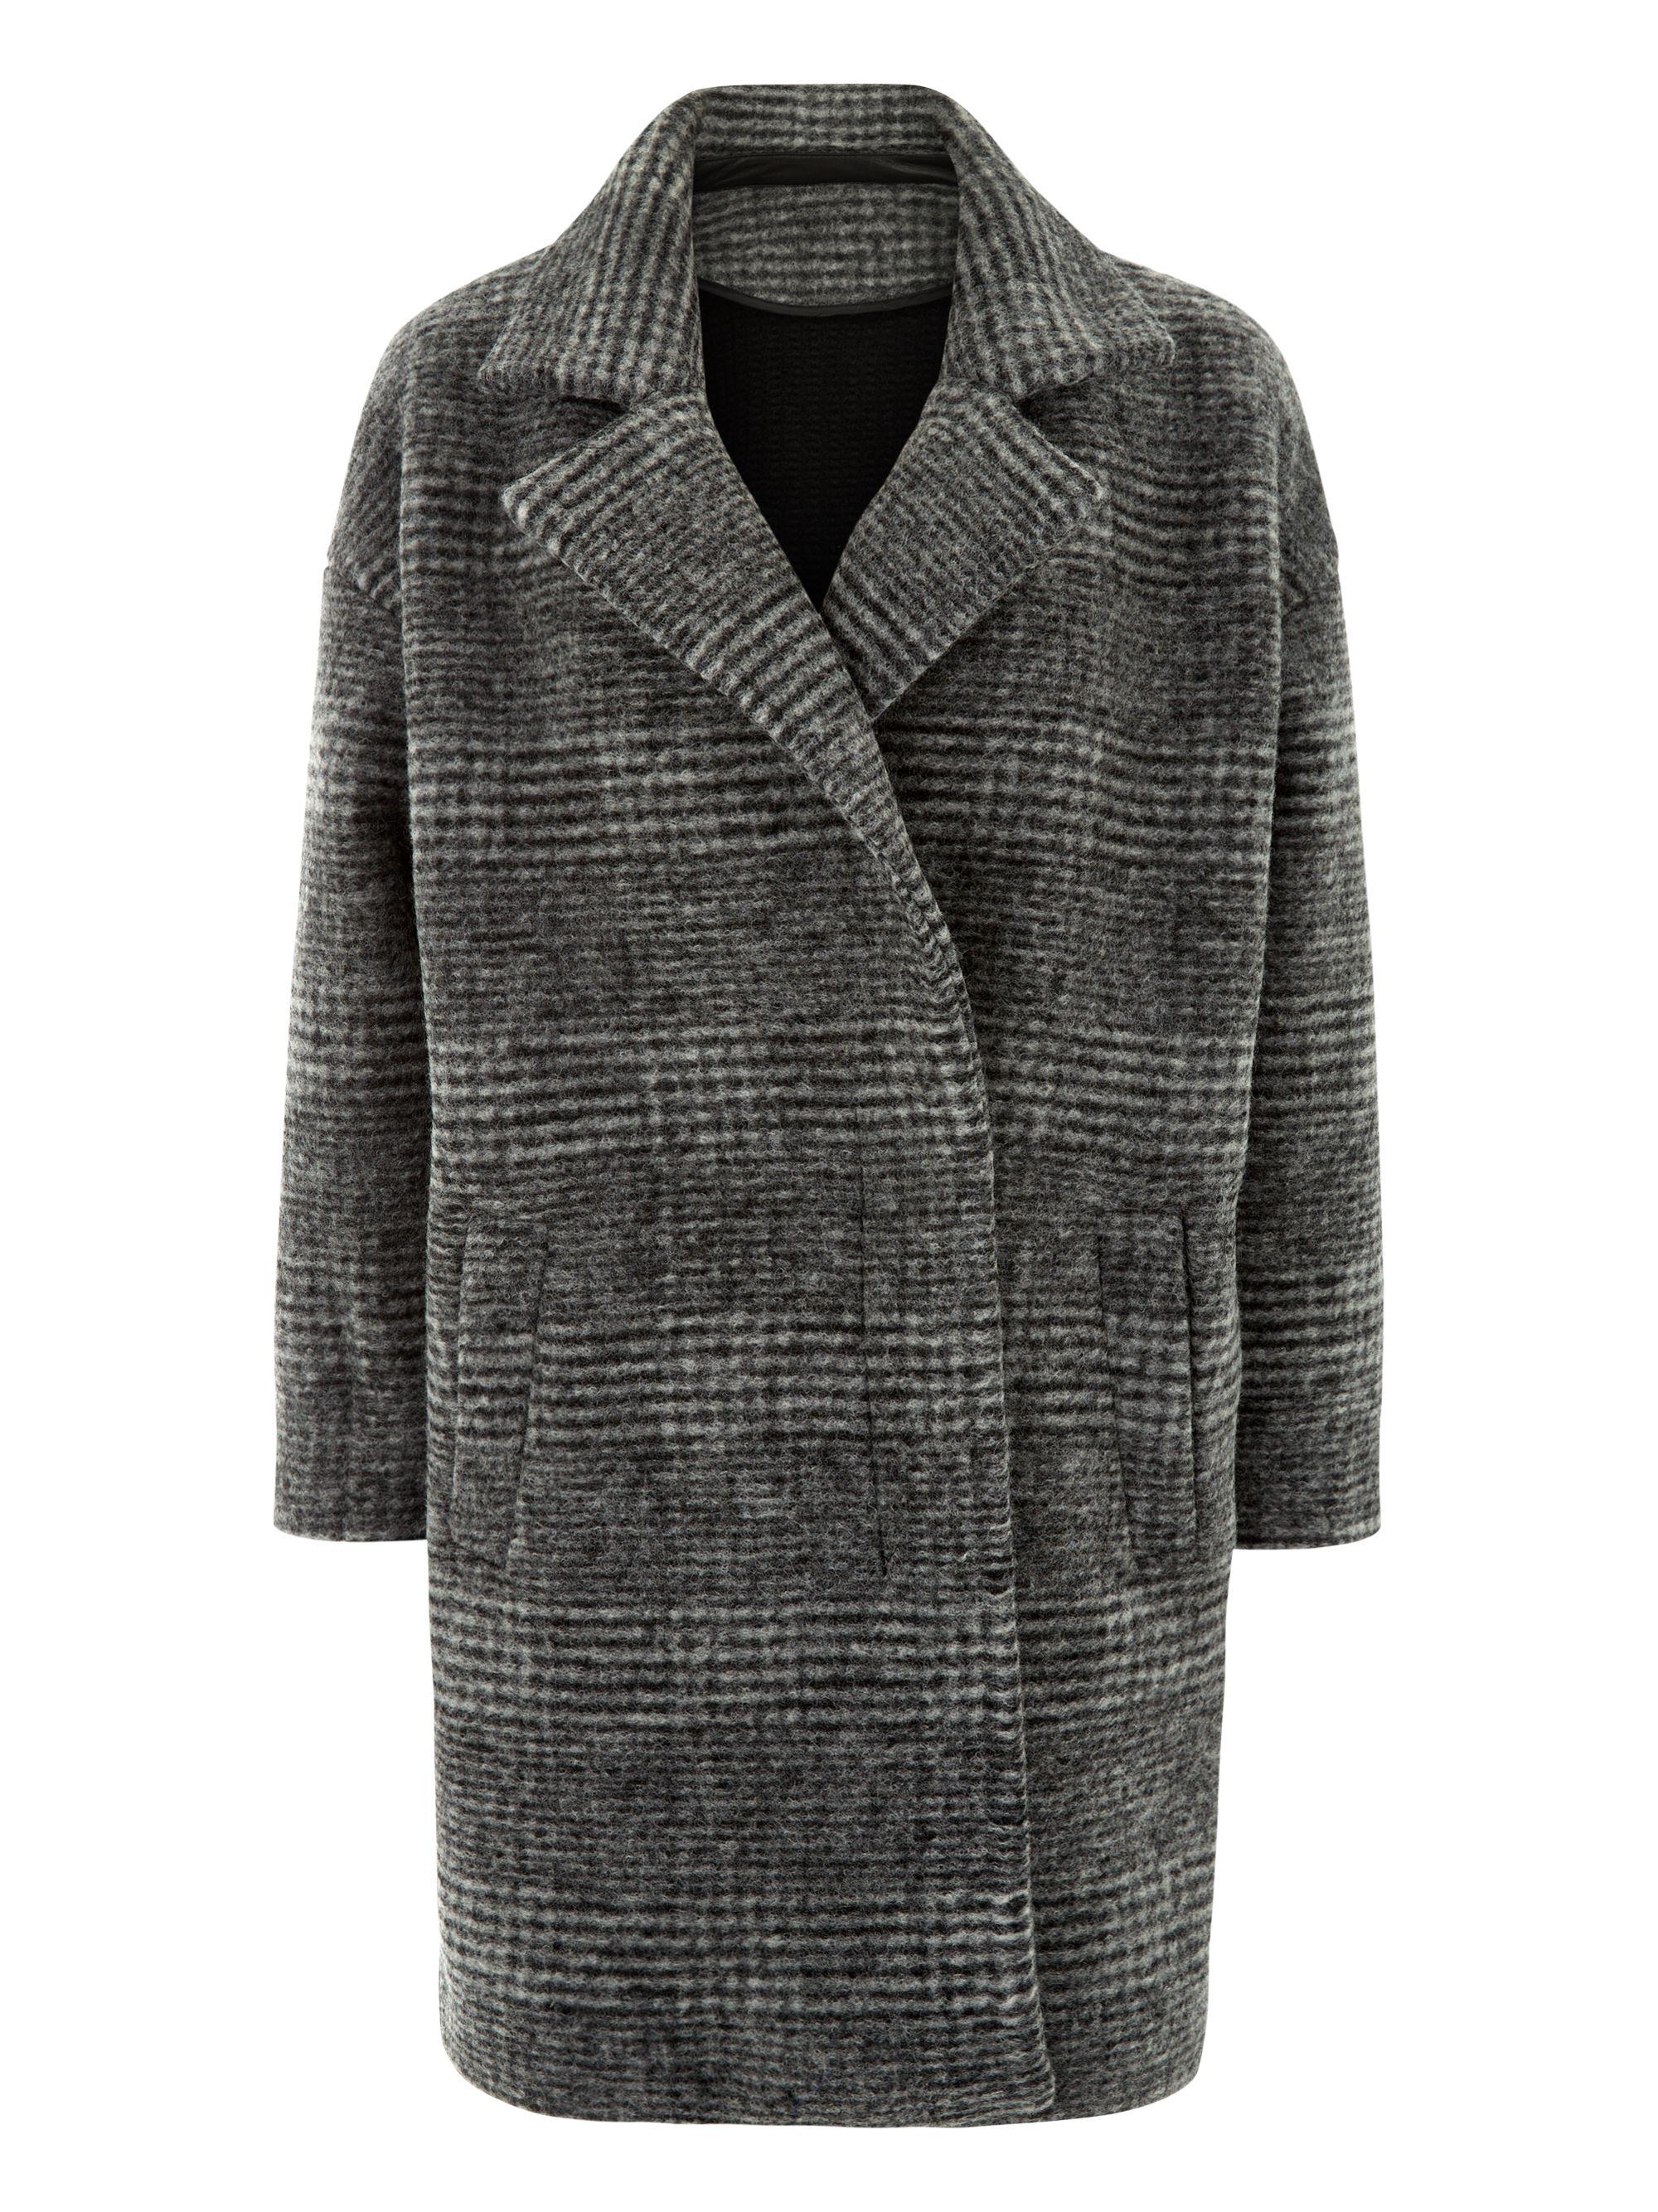 Furlan Black Wool Coat Muubaa AW15   Muubaa A/W 15 Collection